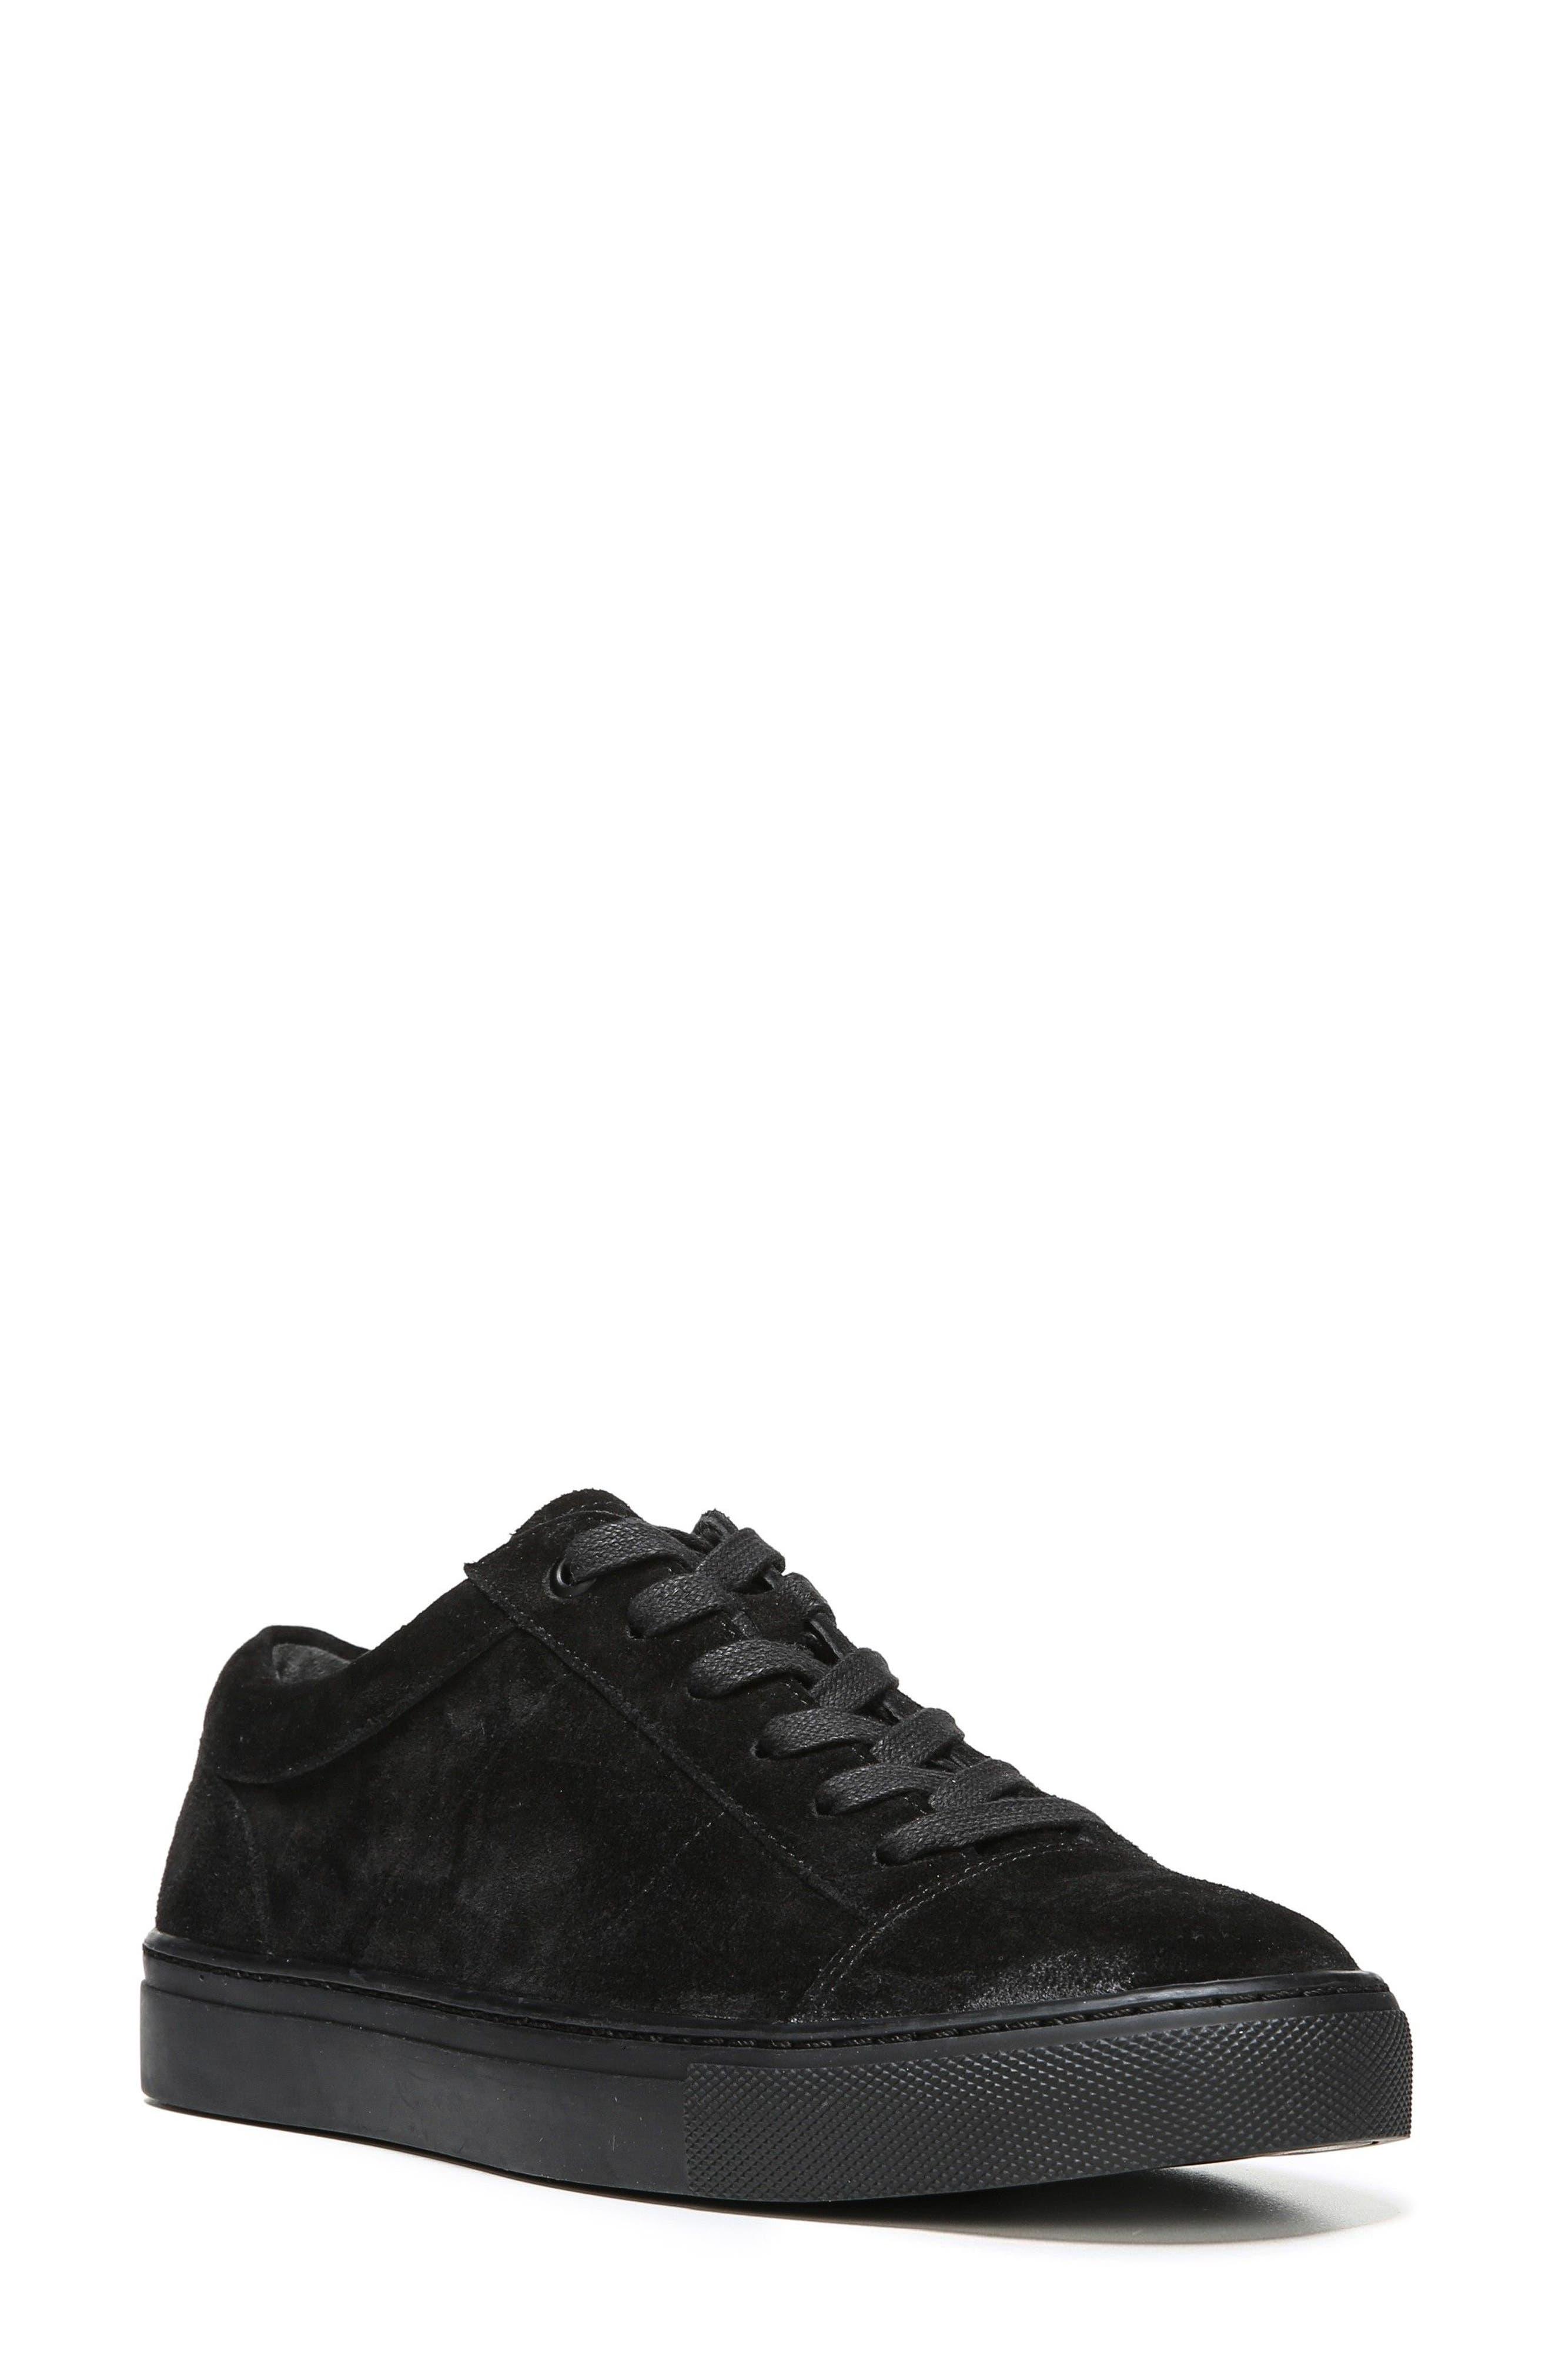 Afton Sneaker,                             Main thumbnail 1, color,                             Black Suede